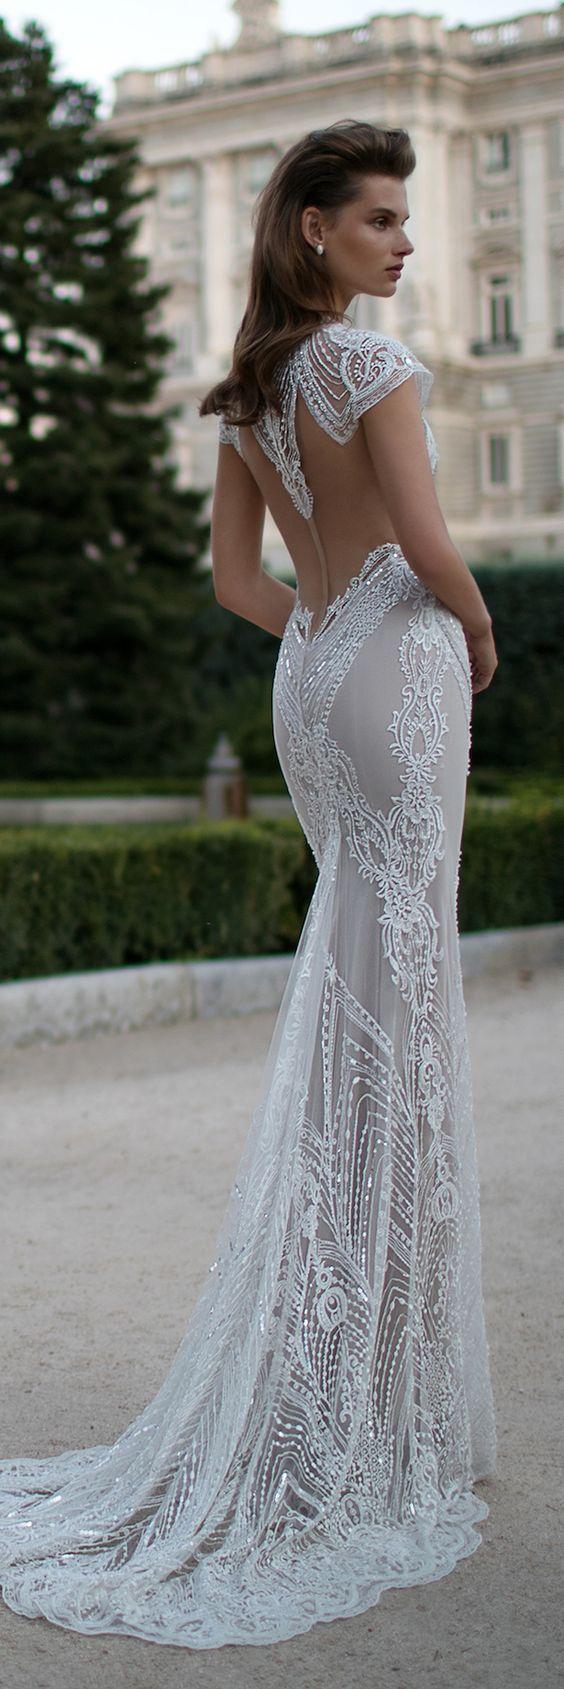 best wedding dresses images on pinterest groom attire bridal